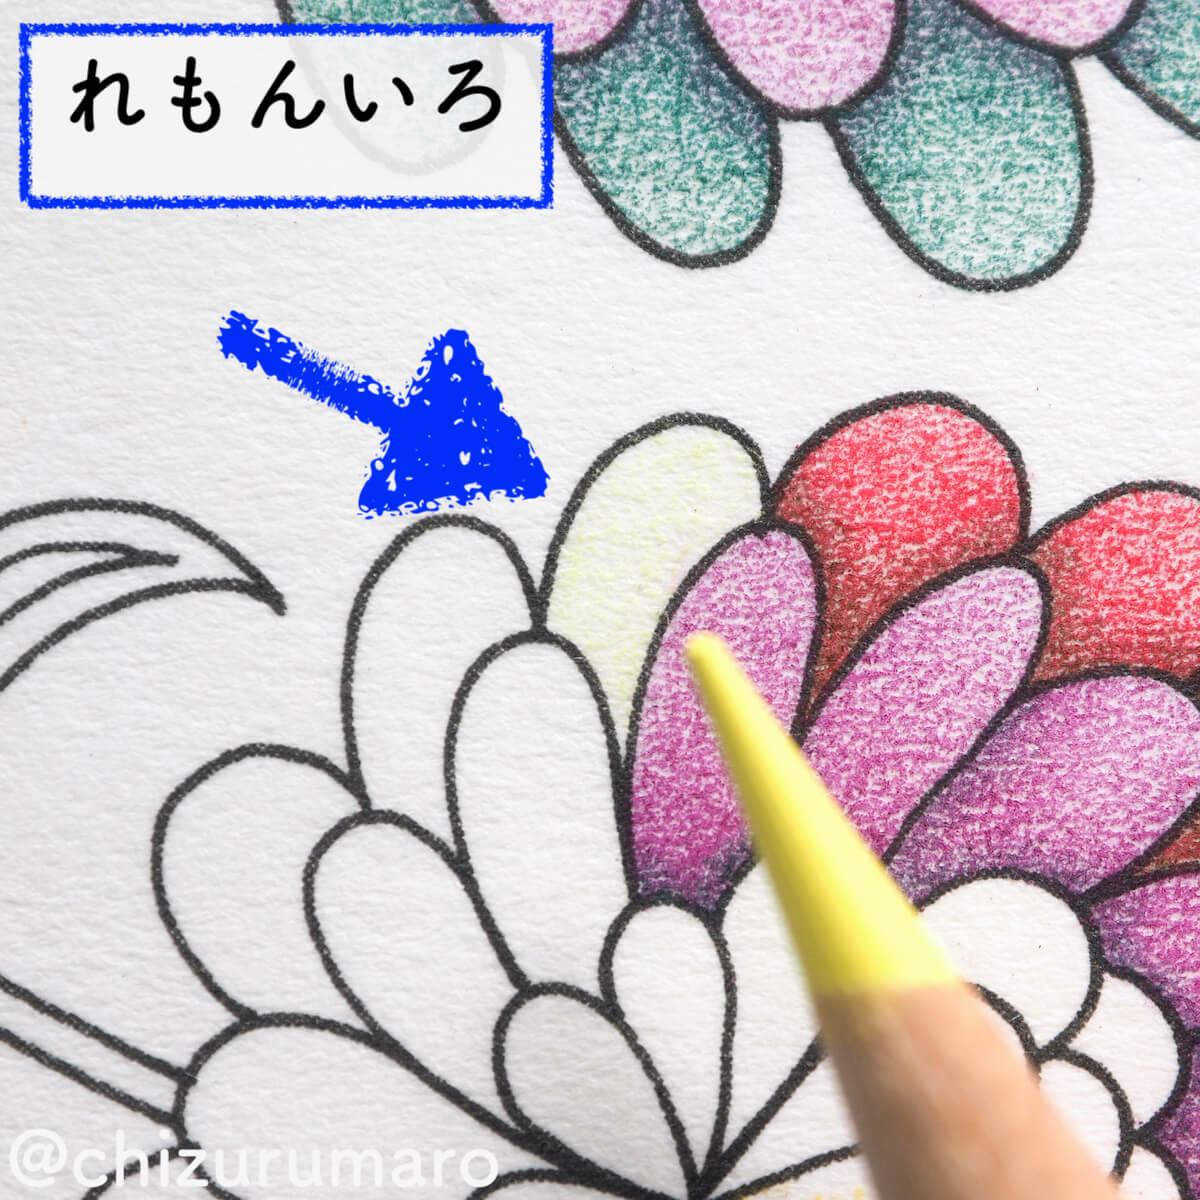 f:id:chizurumaro:20200326115120j:plain